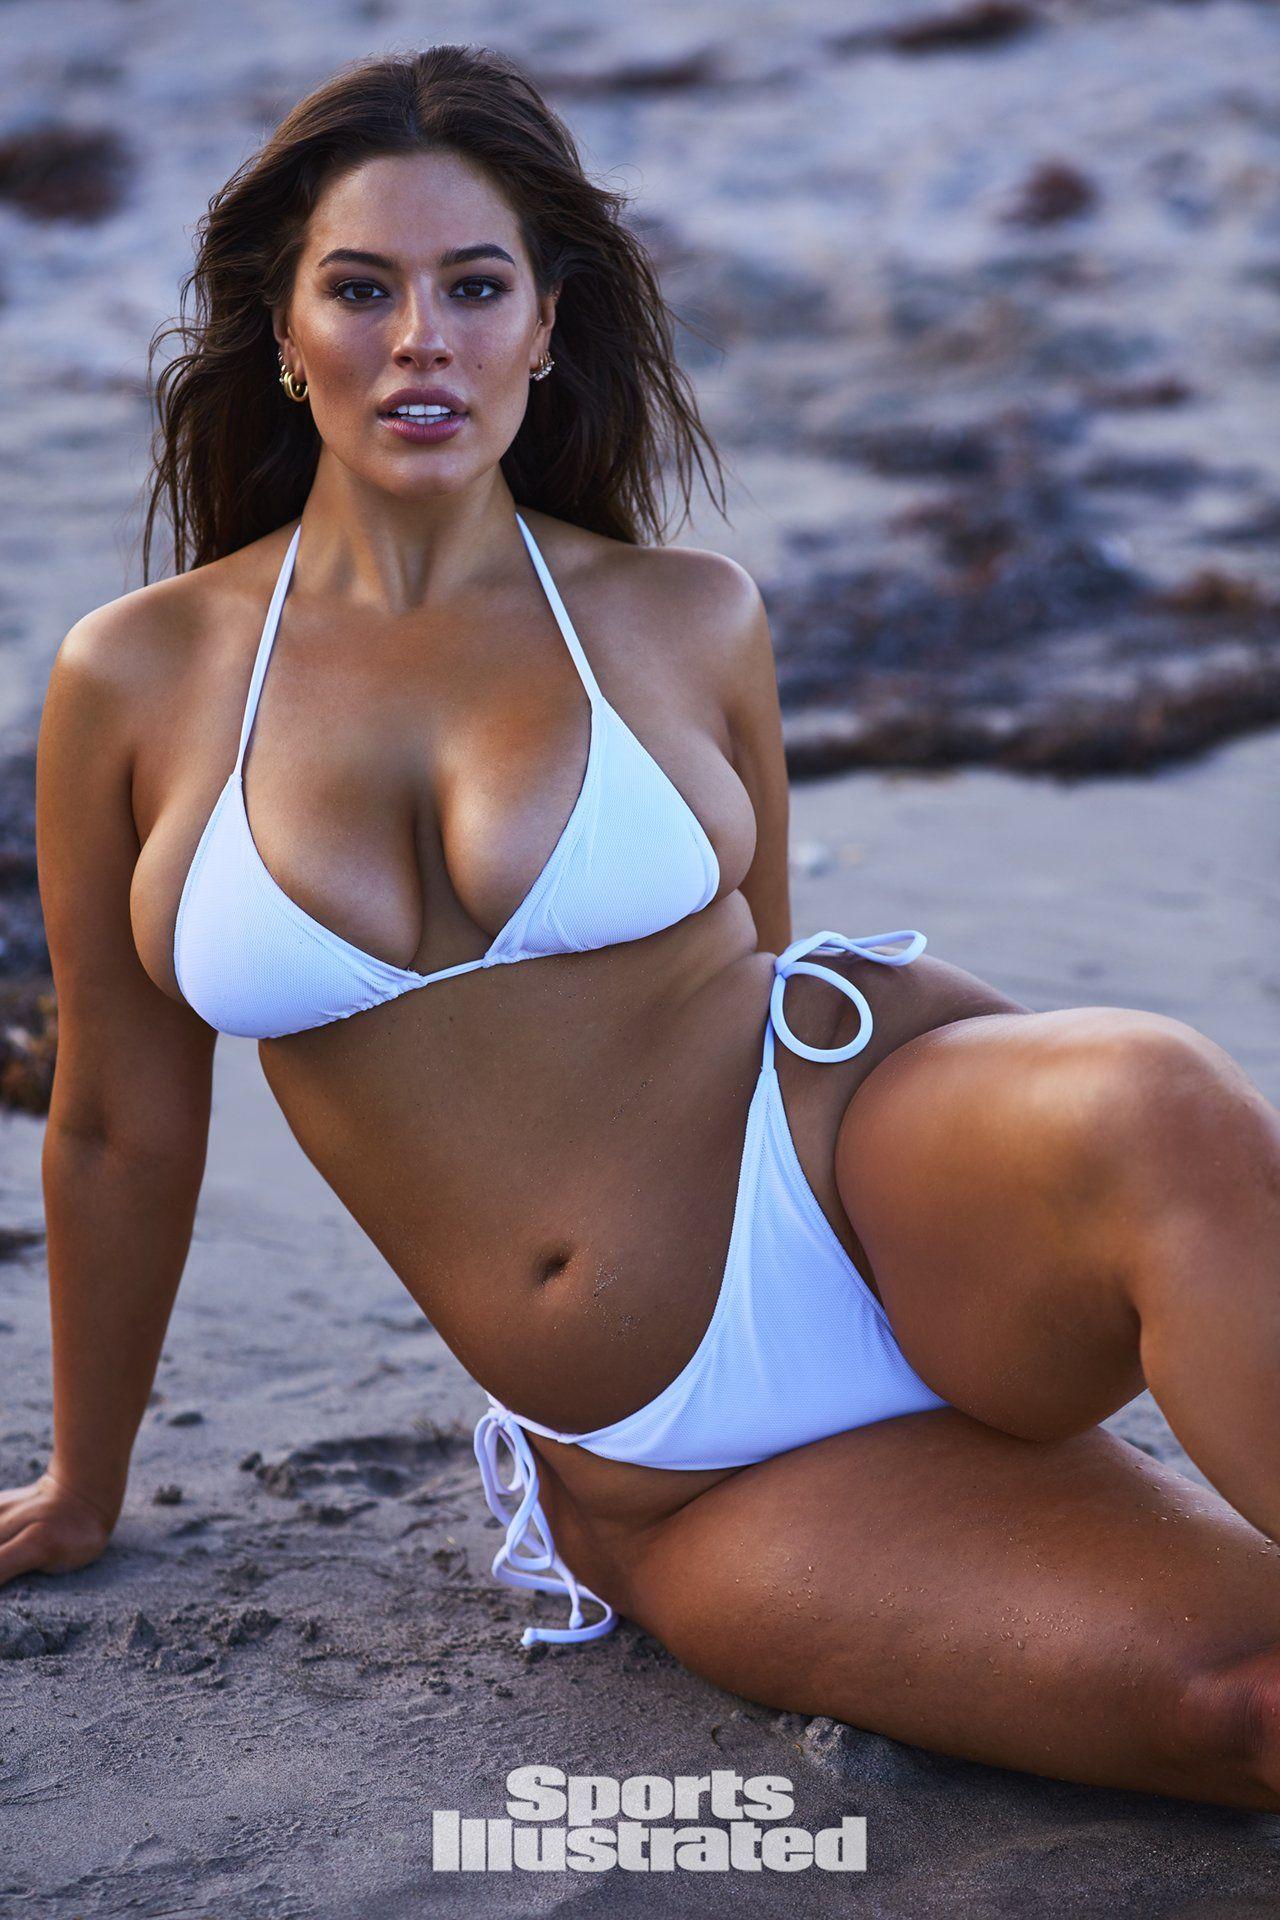 image Christina aguilera nude boobs in mtv diary tv show